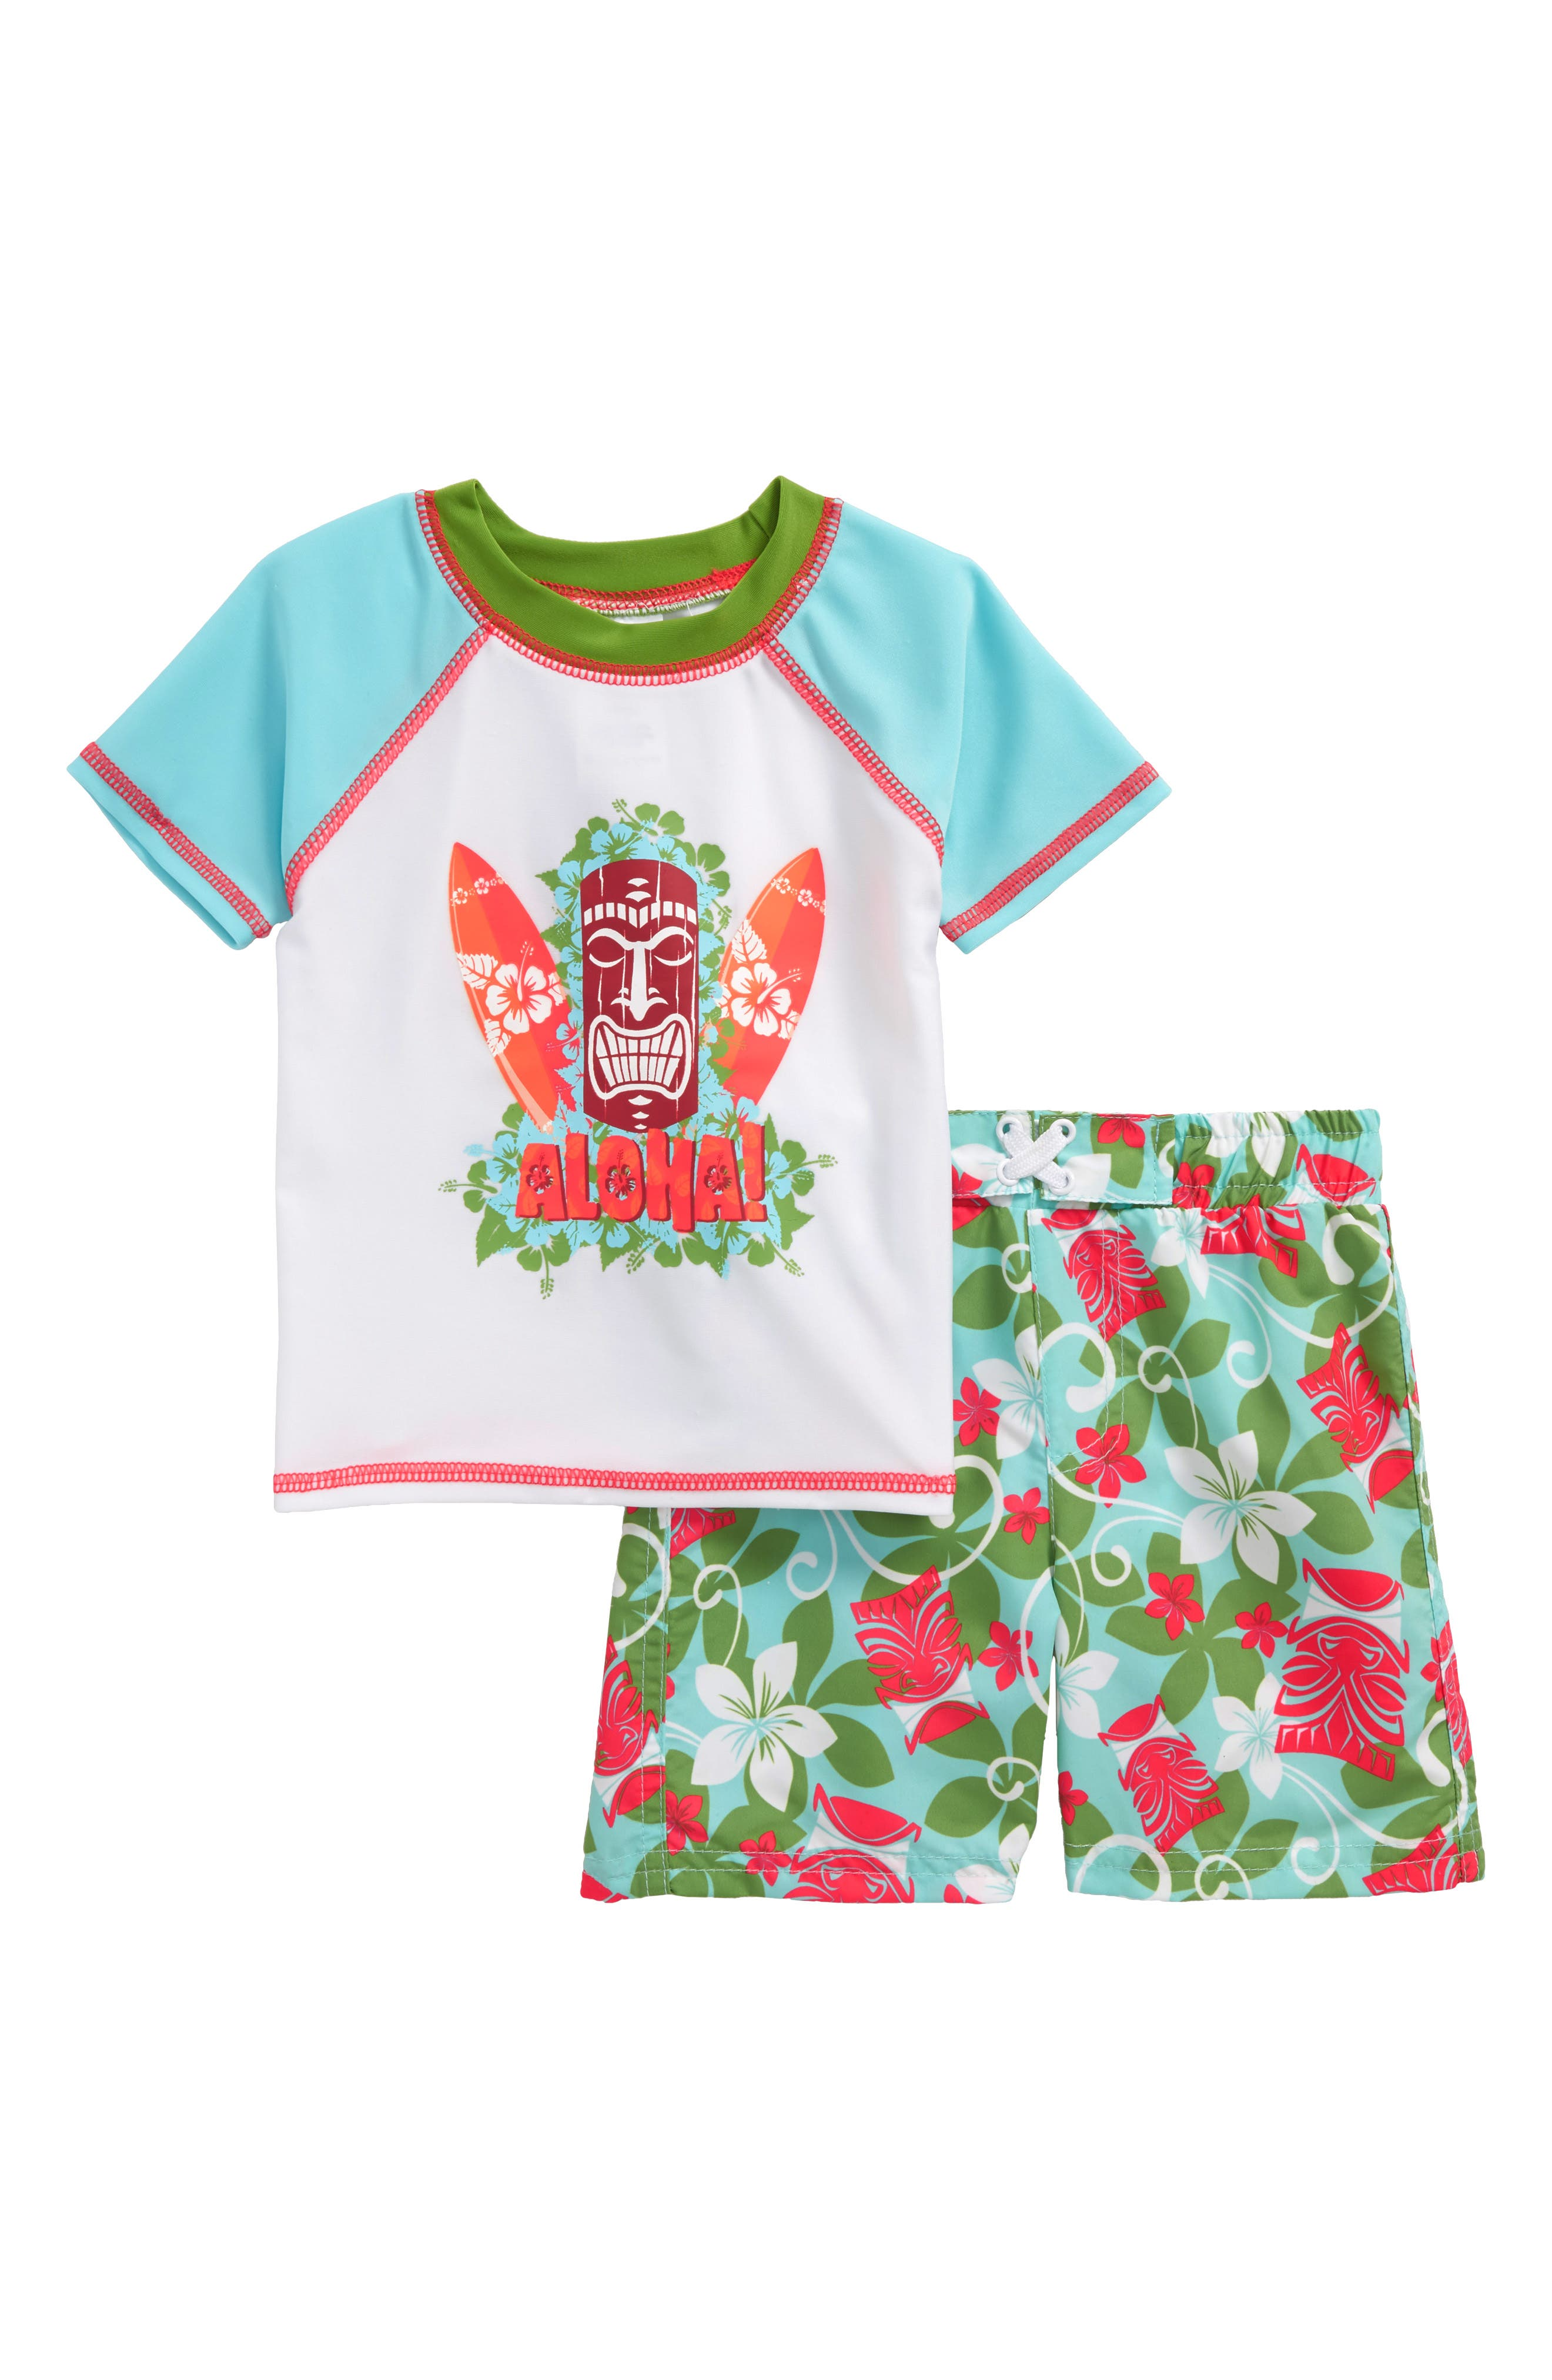 Aloha Tiki Two-Piece Rashguard Swimsuit,                             Main thumbnail 1, color,                             Blue/ Green